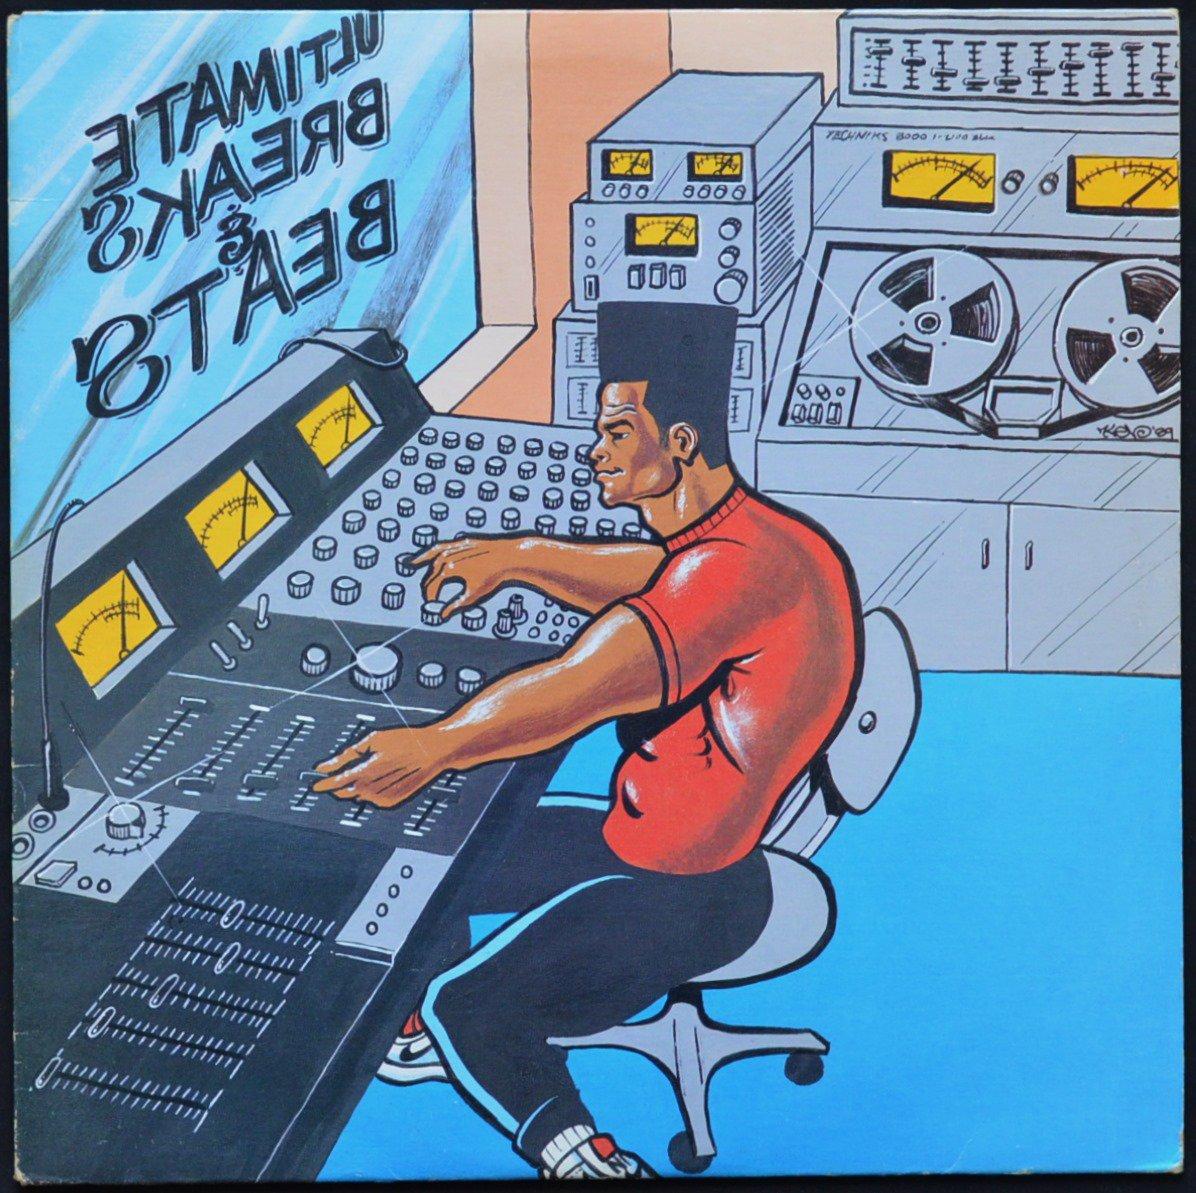 V.A.(RUFUS THOMAS,JIM DANDY,PLEASURE...) / ULTIMATE BREAKS & BEATS - 523 (LP)